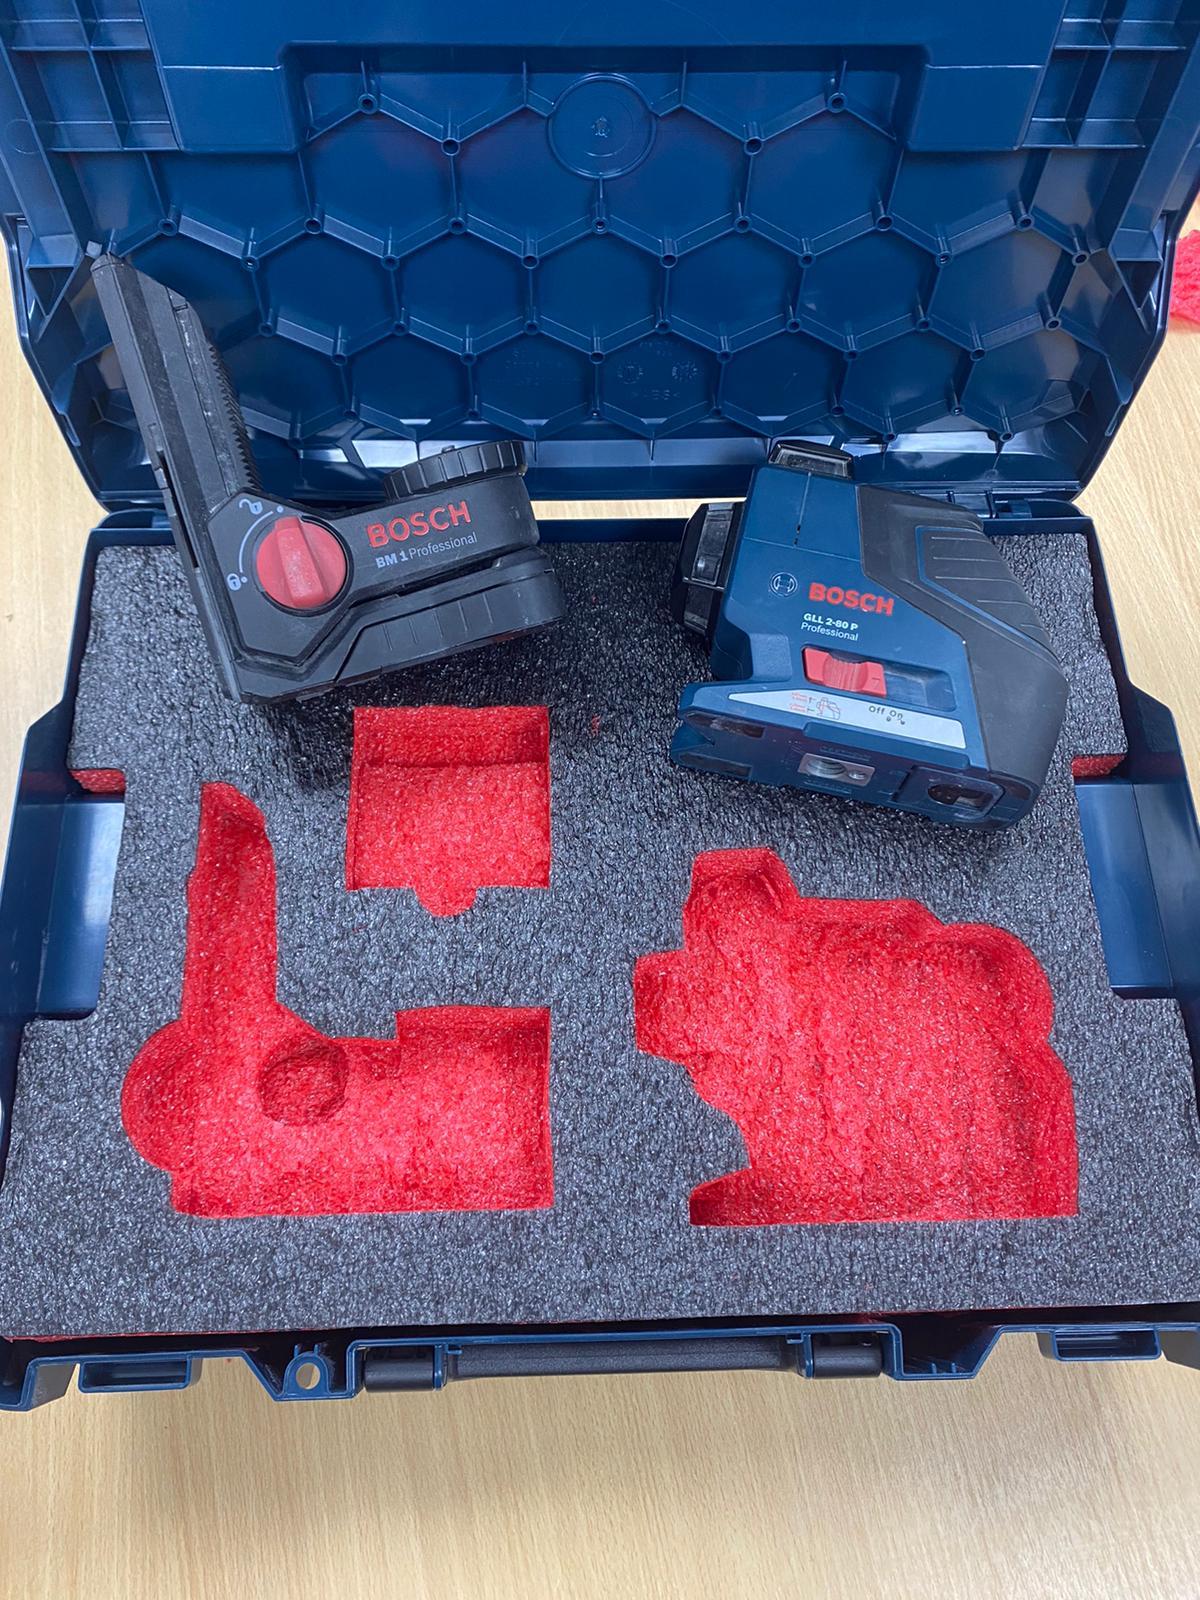 Bosch L-boxx inserts